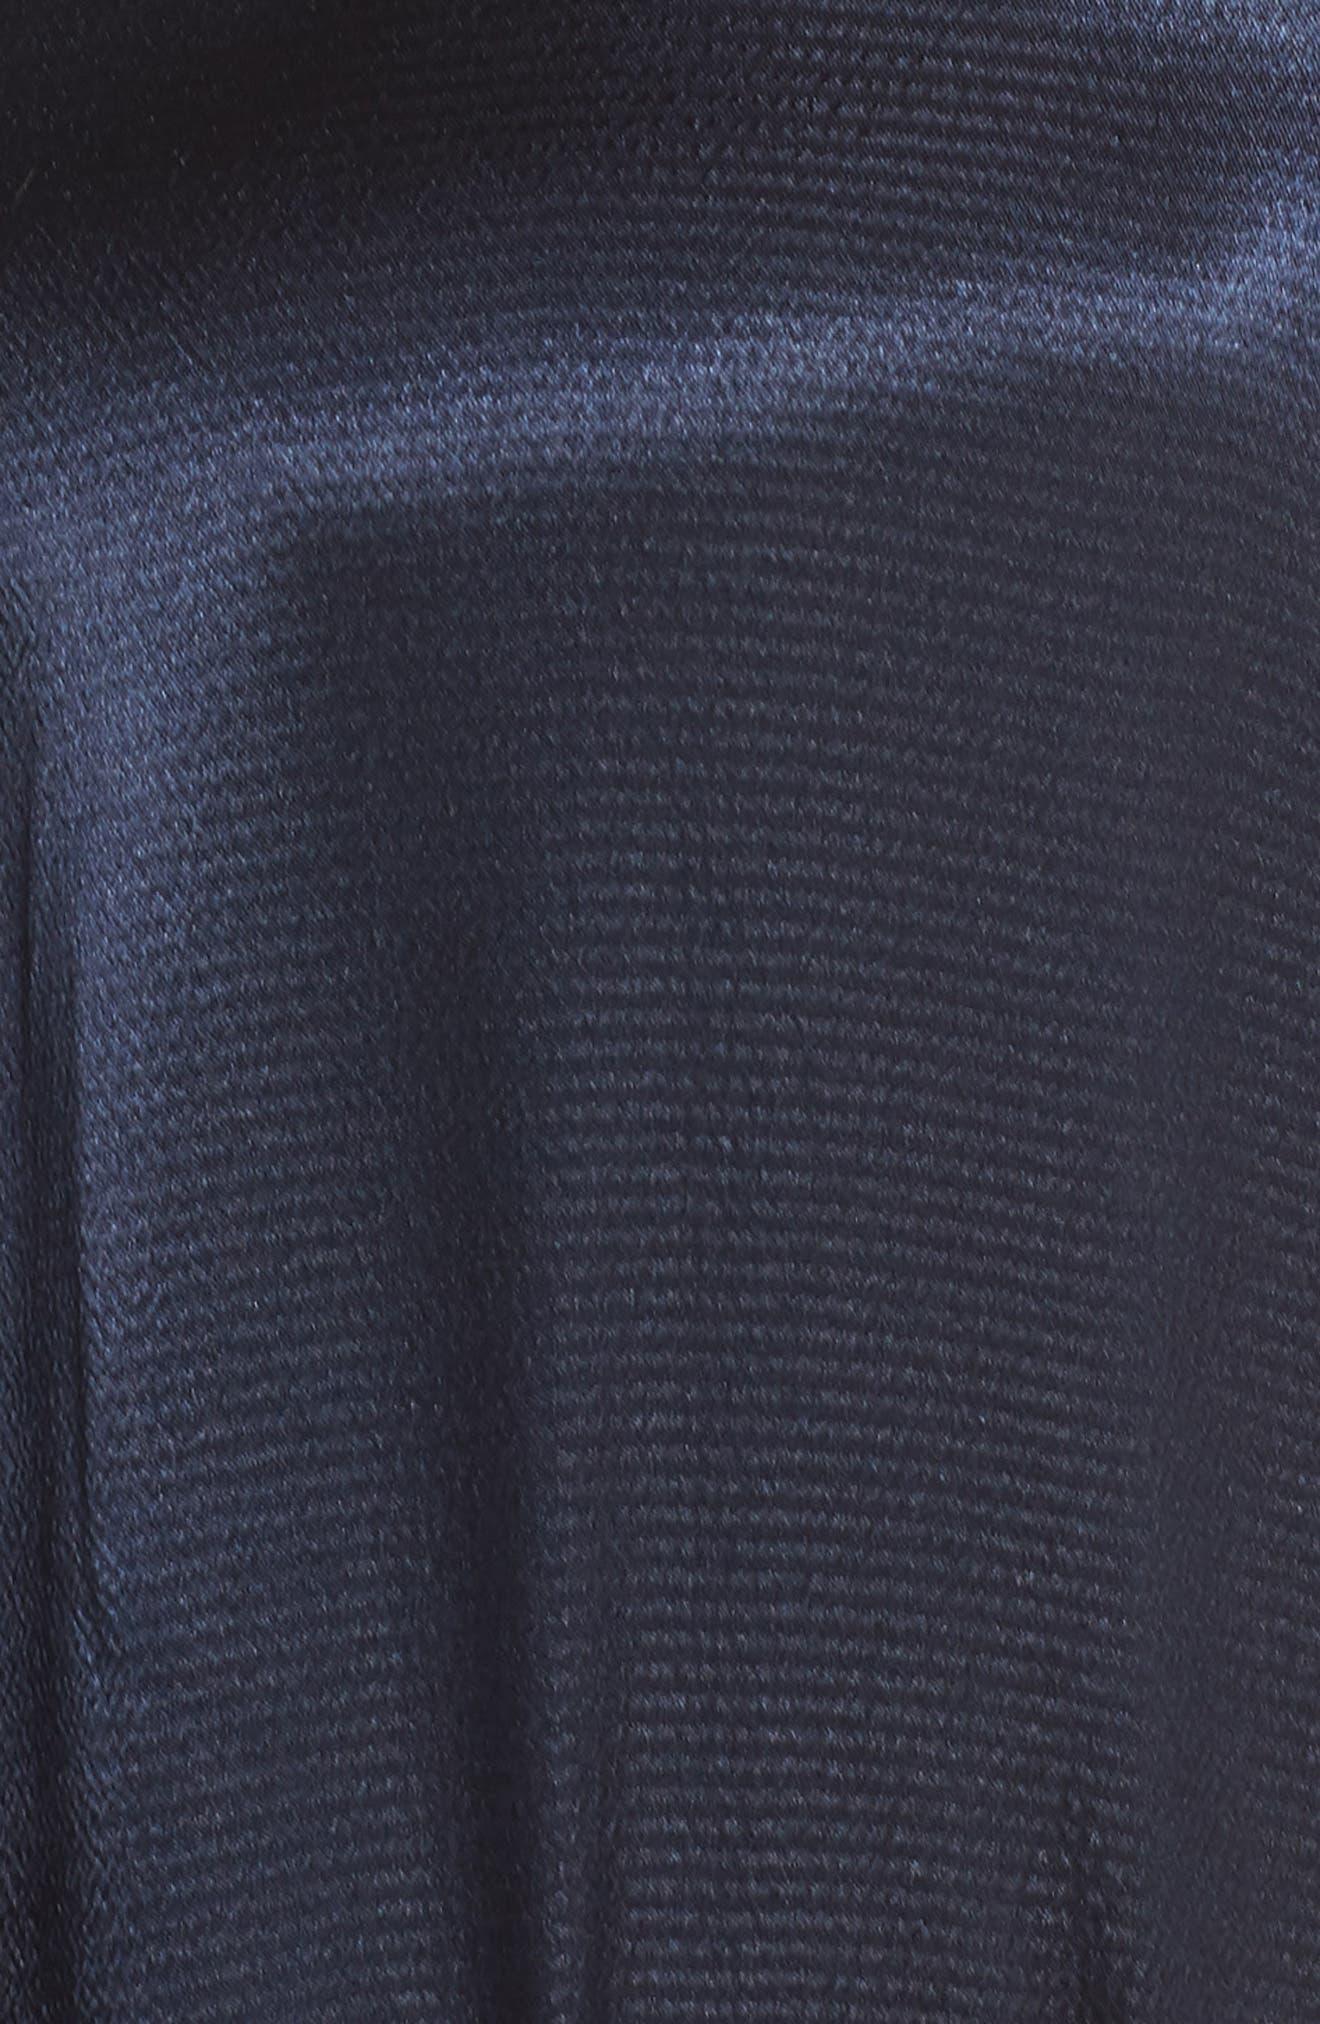 Asymmetrical Sleeveless Trapeze Dress,                             Alternate thumbnail 6, color,                             Blue Moon